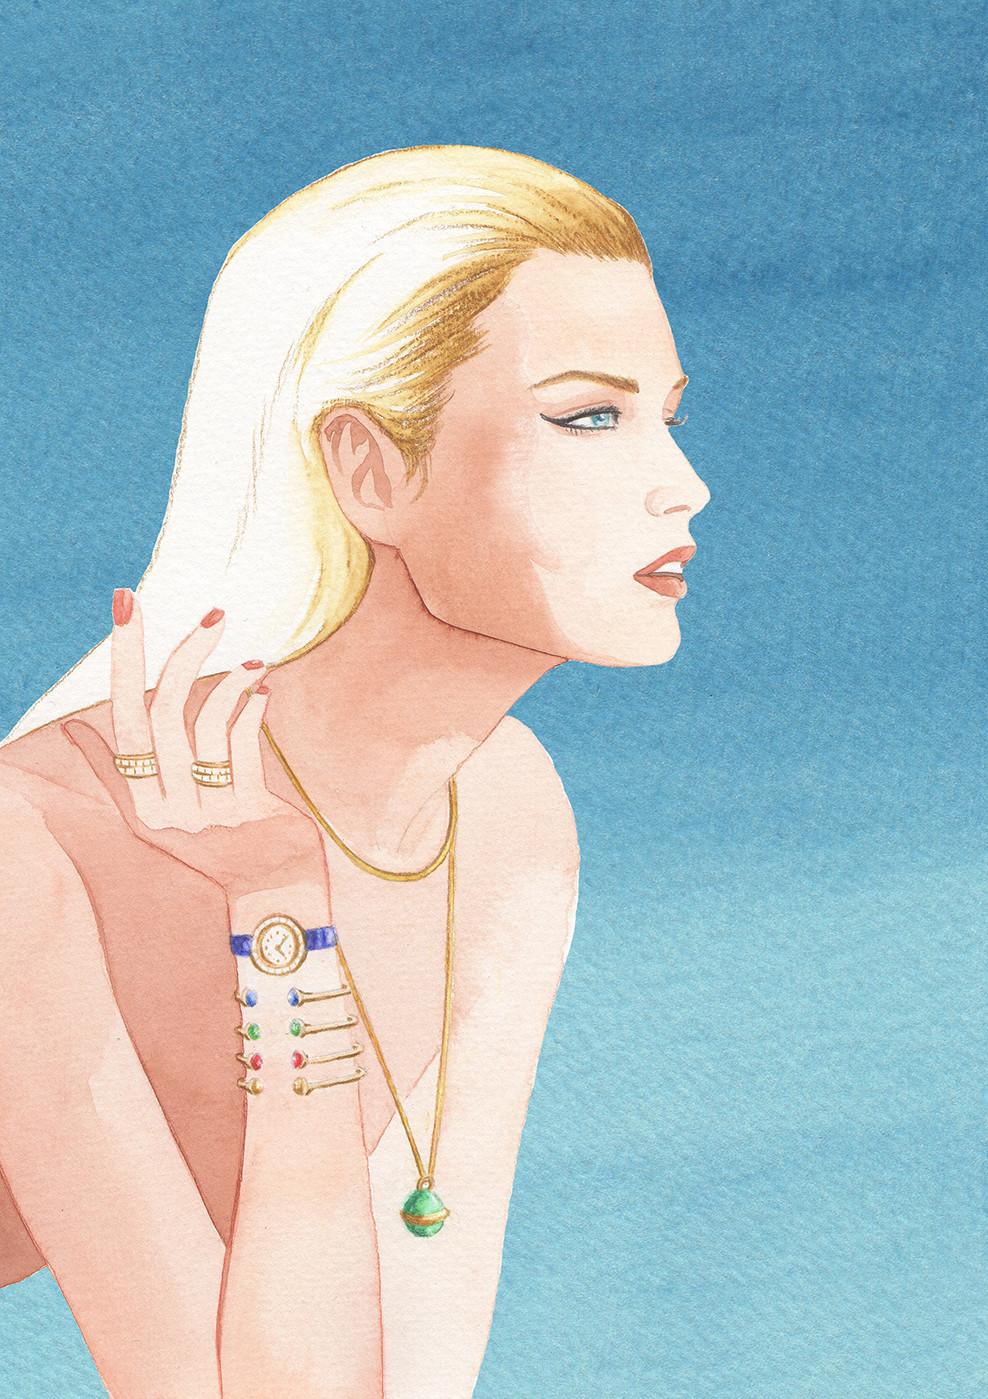 Piaget Possession new campaign featuring Doutzen Kroes illustration by Geoffrey Beloeil